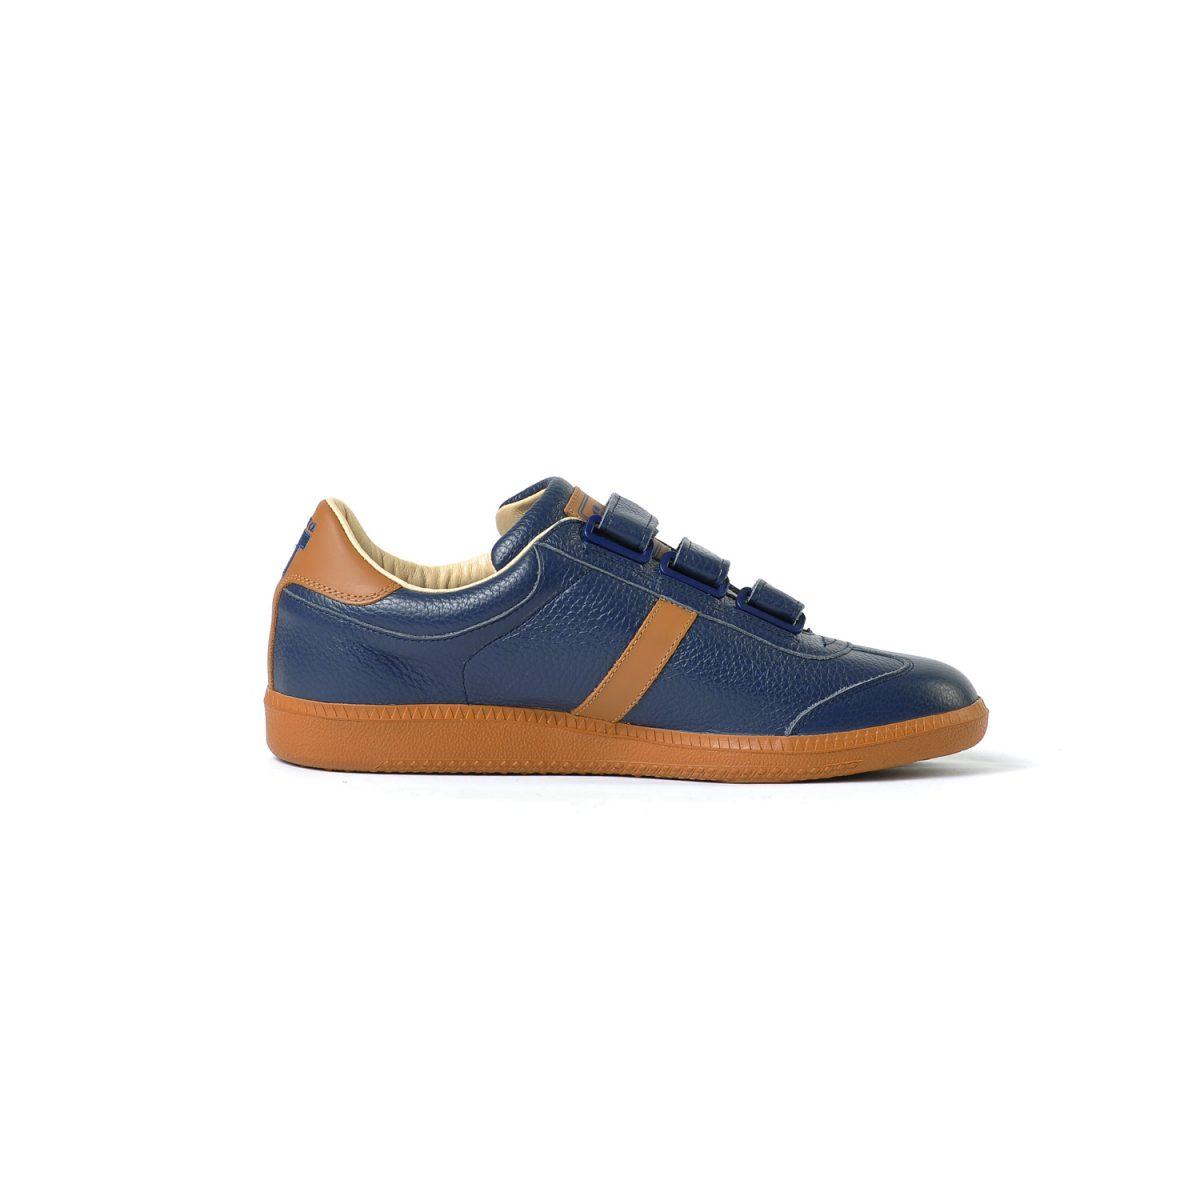 Tisza shoes - Compakt Delux - Navy-tobacco